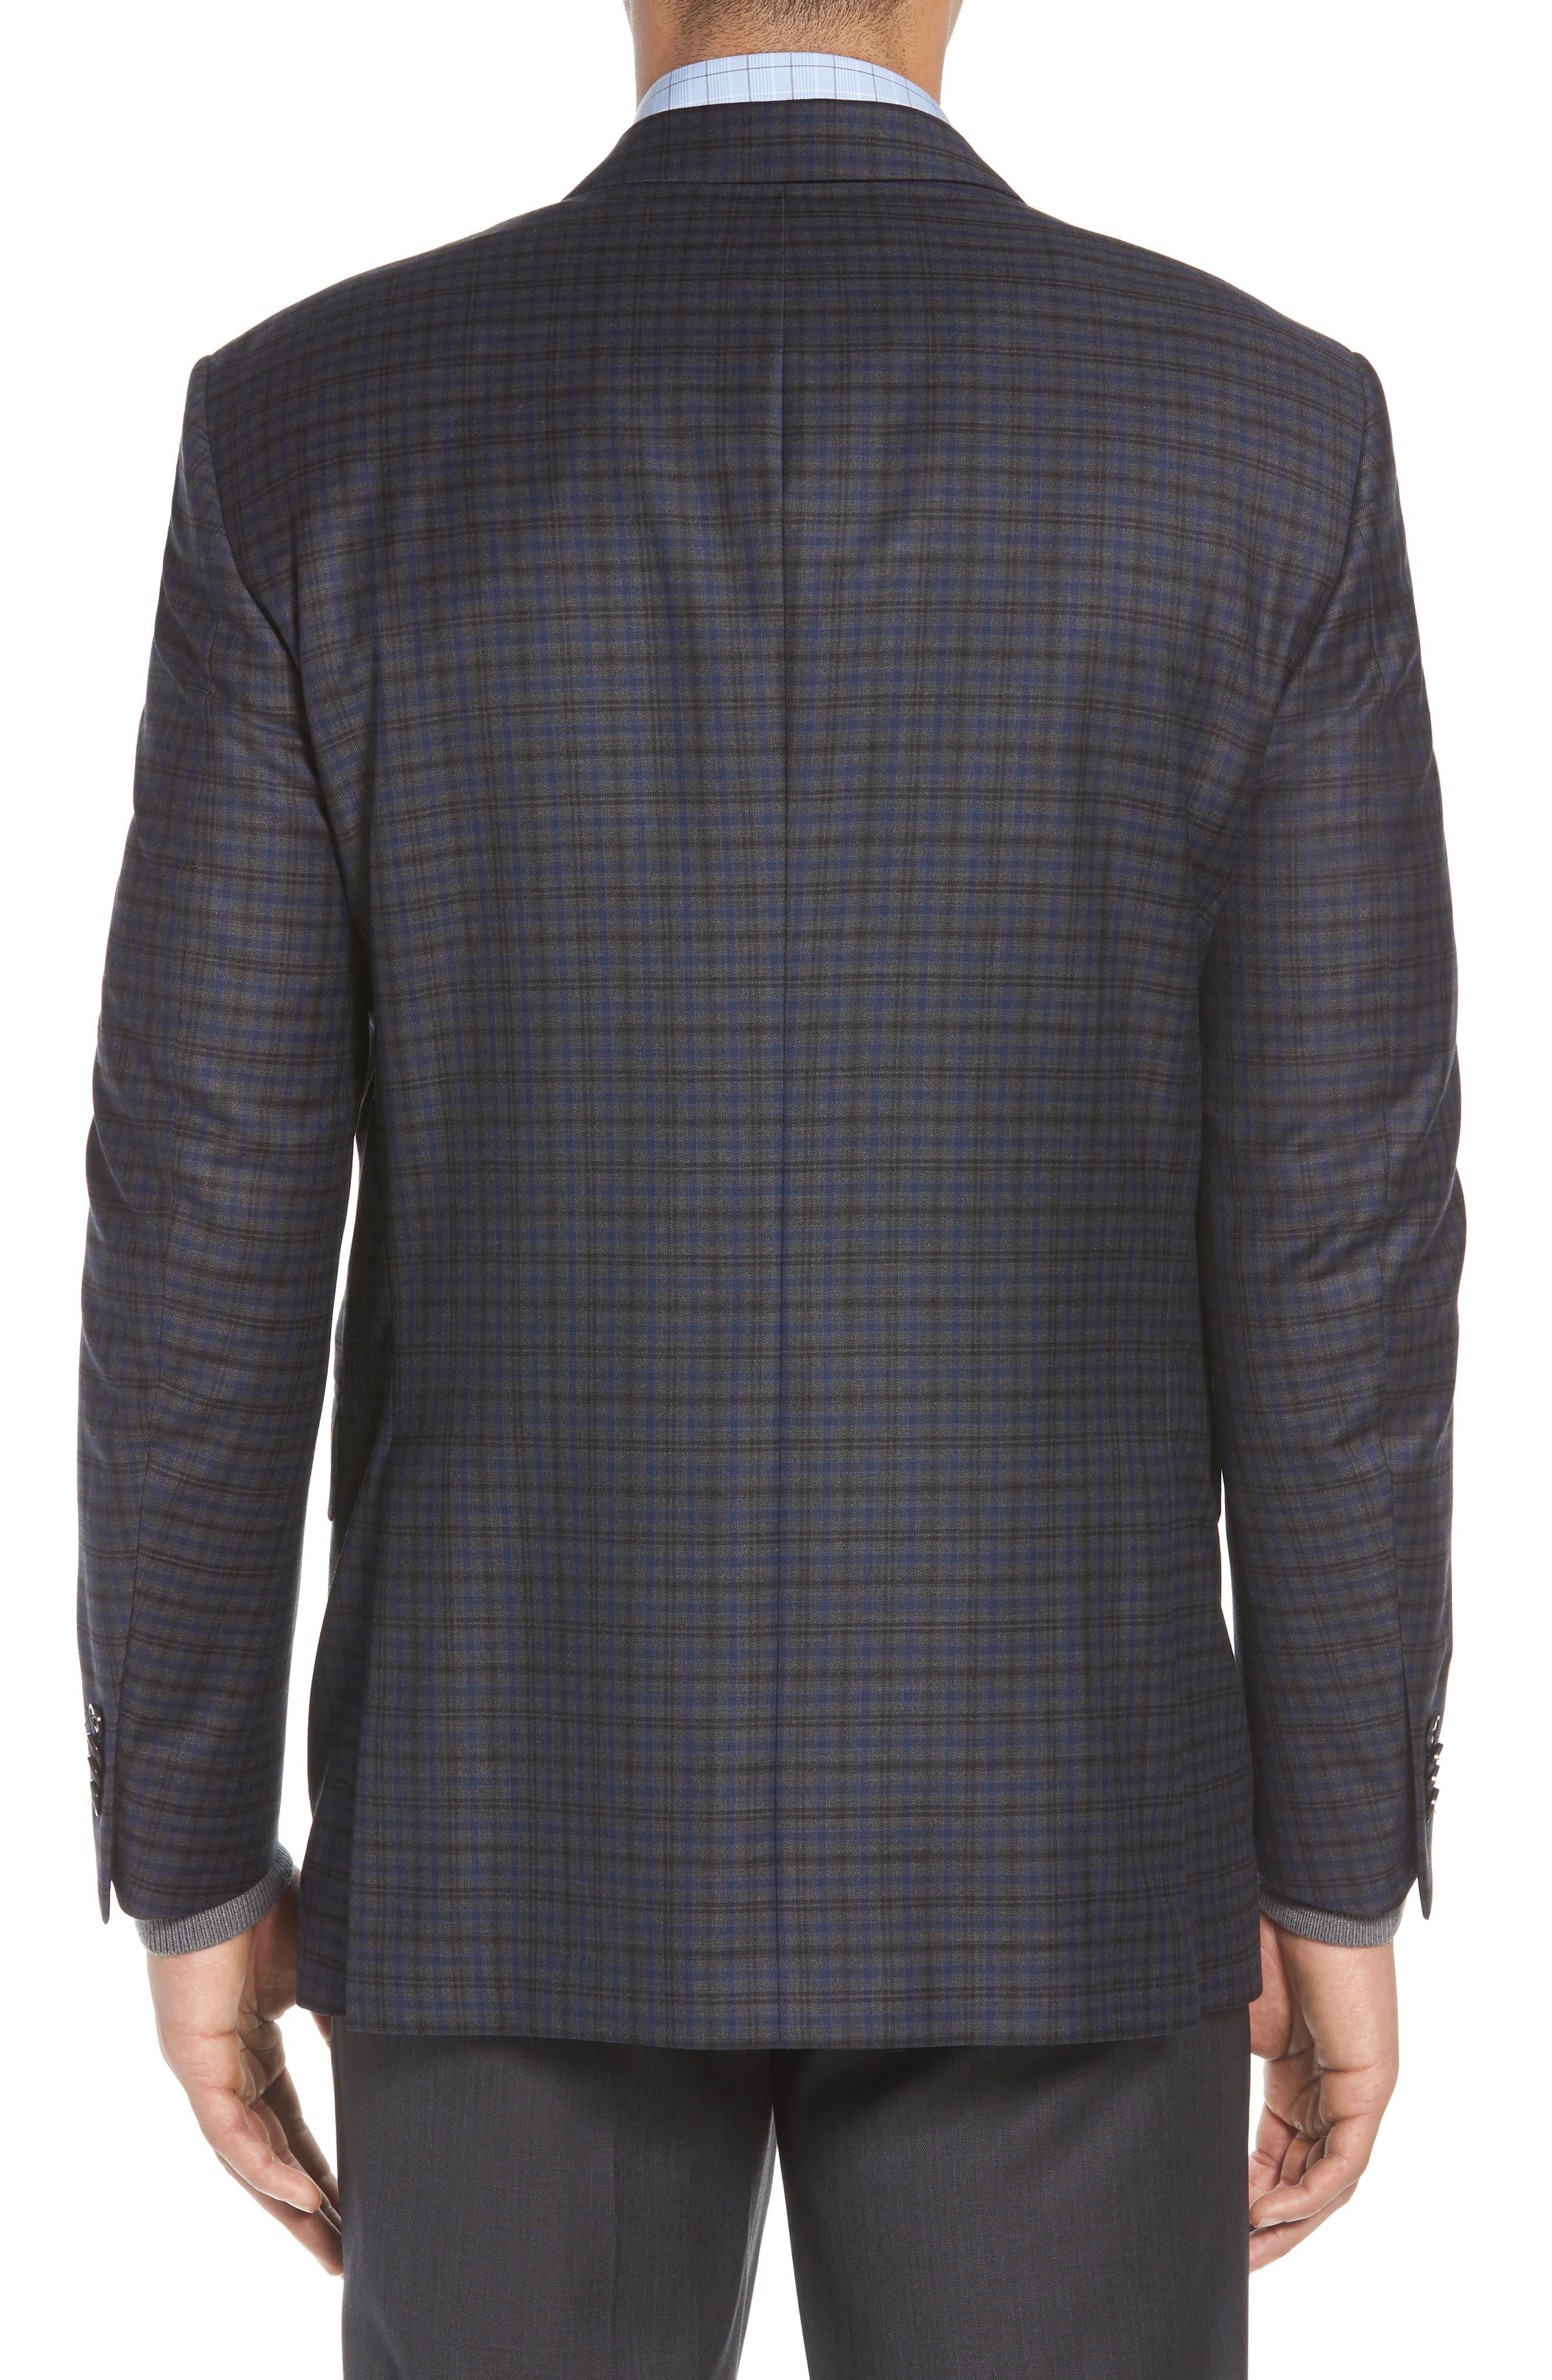 PETER MILLAR,                             Classic Fit Windowpane Check Wool Sport Coat,                             Alternate thumbnail 2, color,                             020